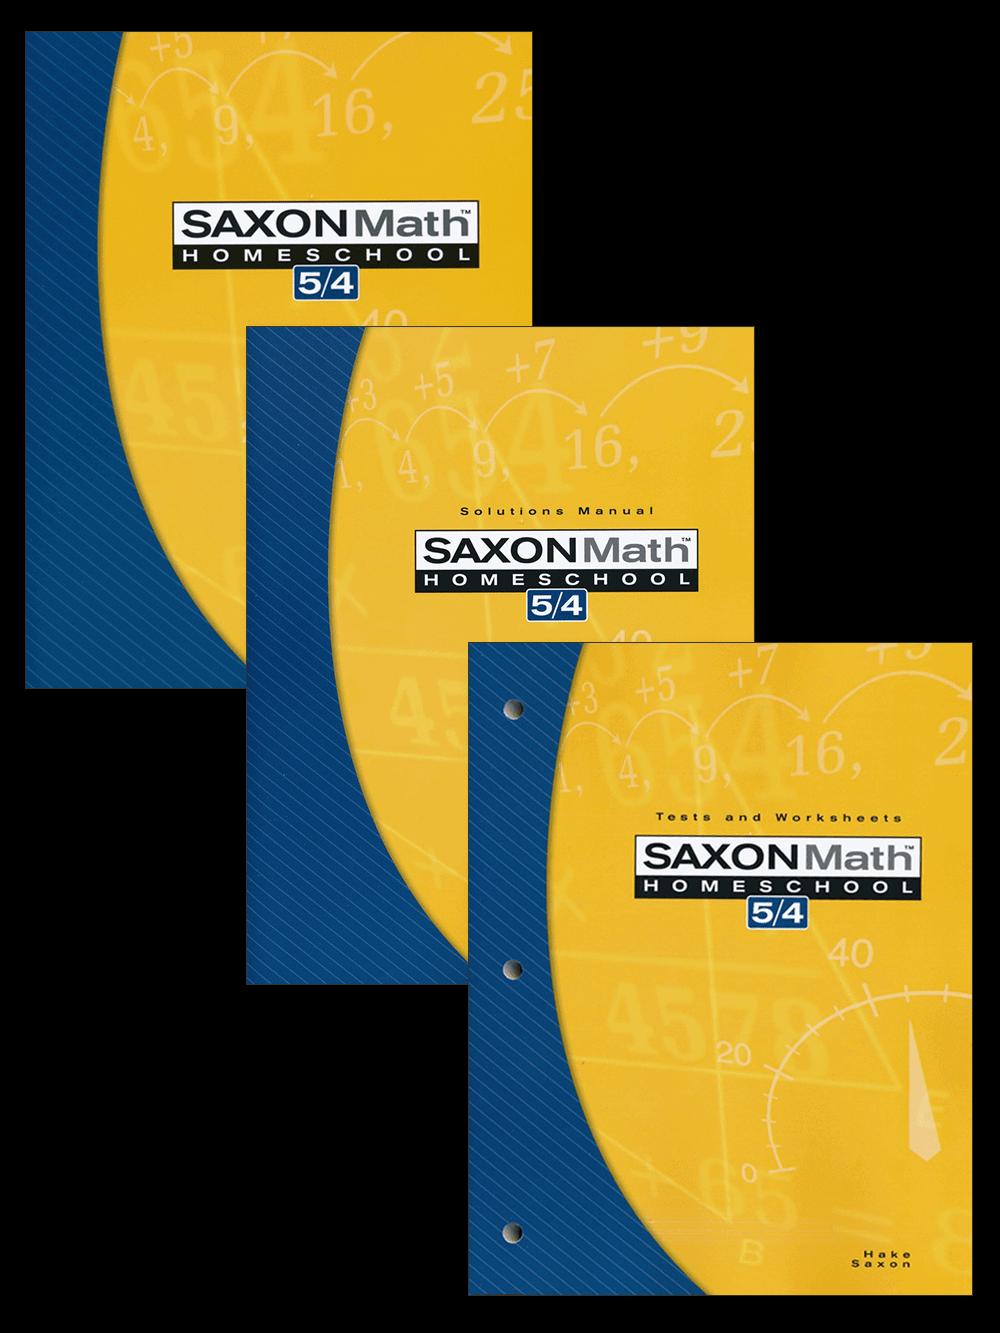 saxon math 5/4 homeschool curriculum kit